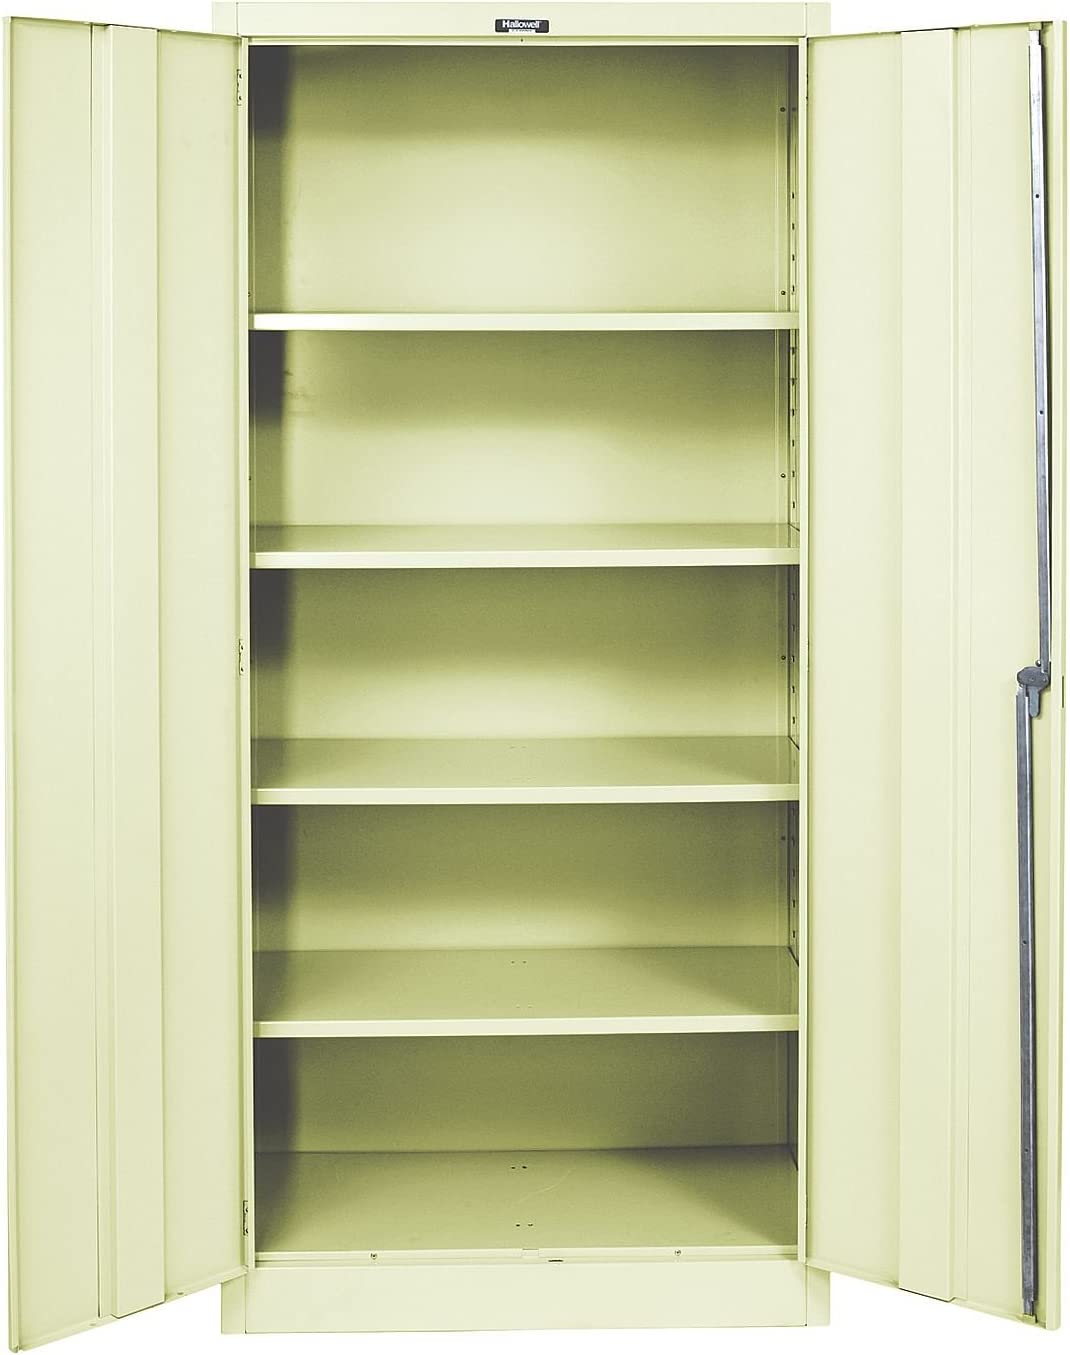 Amazon Com 400 Series 2 Door Storage Cabinet Color Parchment Office Products